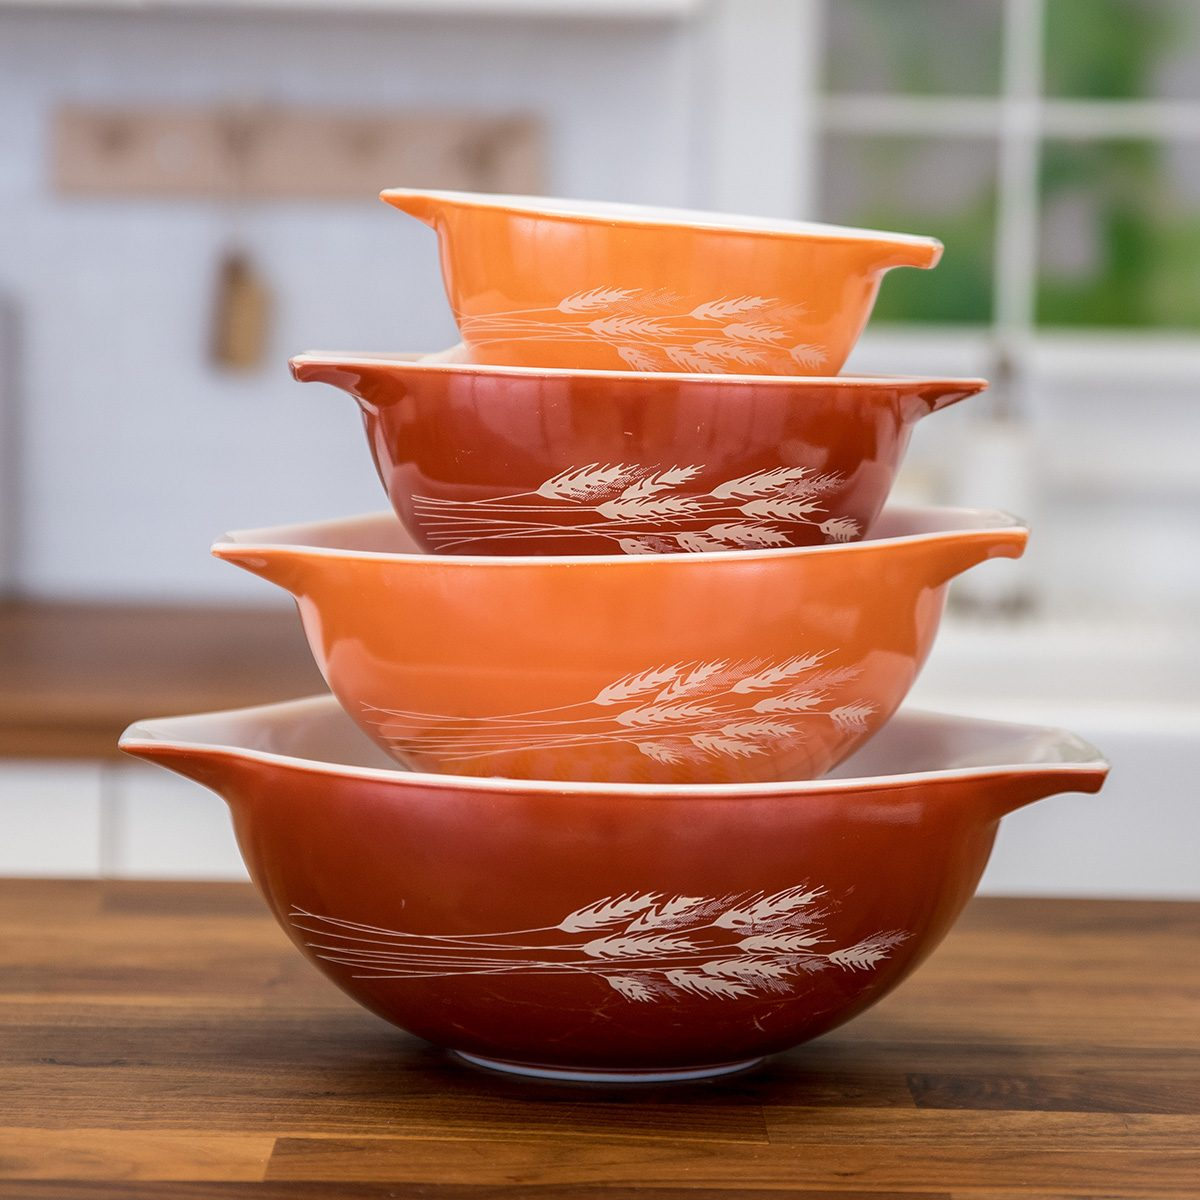 Vintage Pyrex bowls in wheat pattern